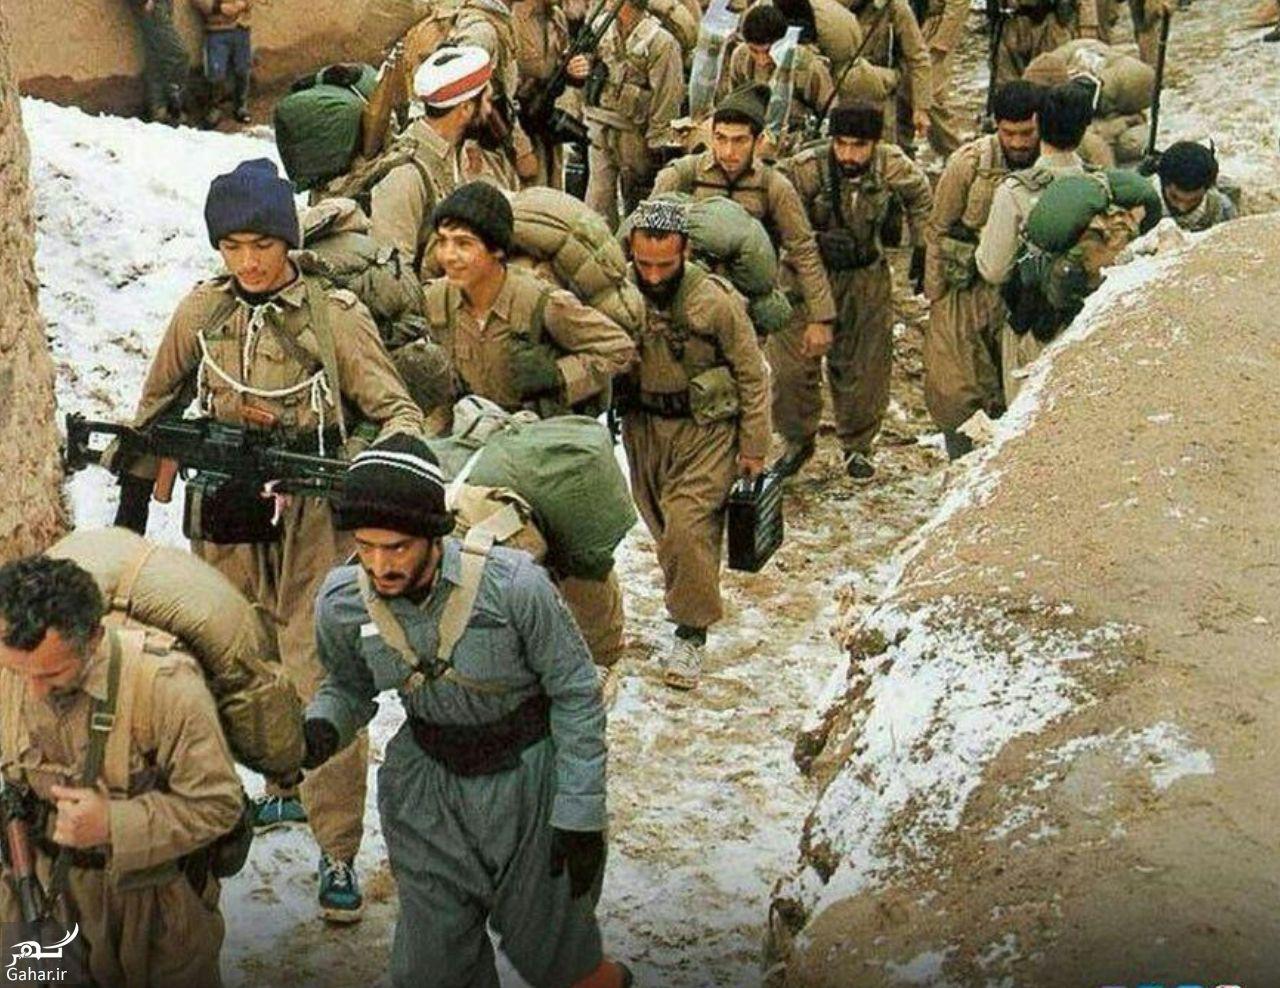 261334 Gahar ir زیباترین تفسیر از قرعه ایران در گروه مرگ ،از جنگ تا جام جهانی / عکس